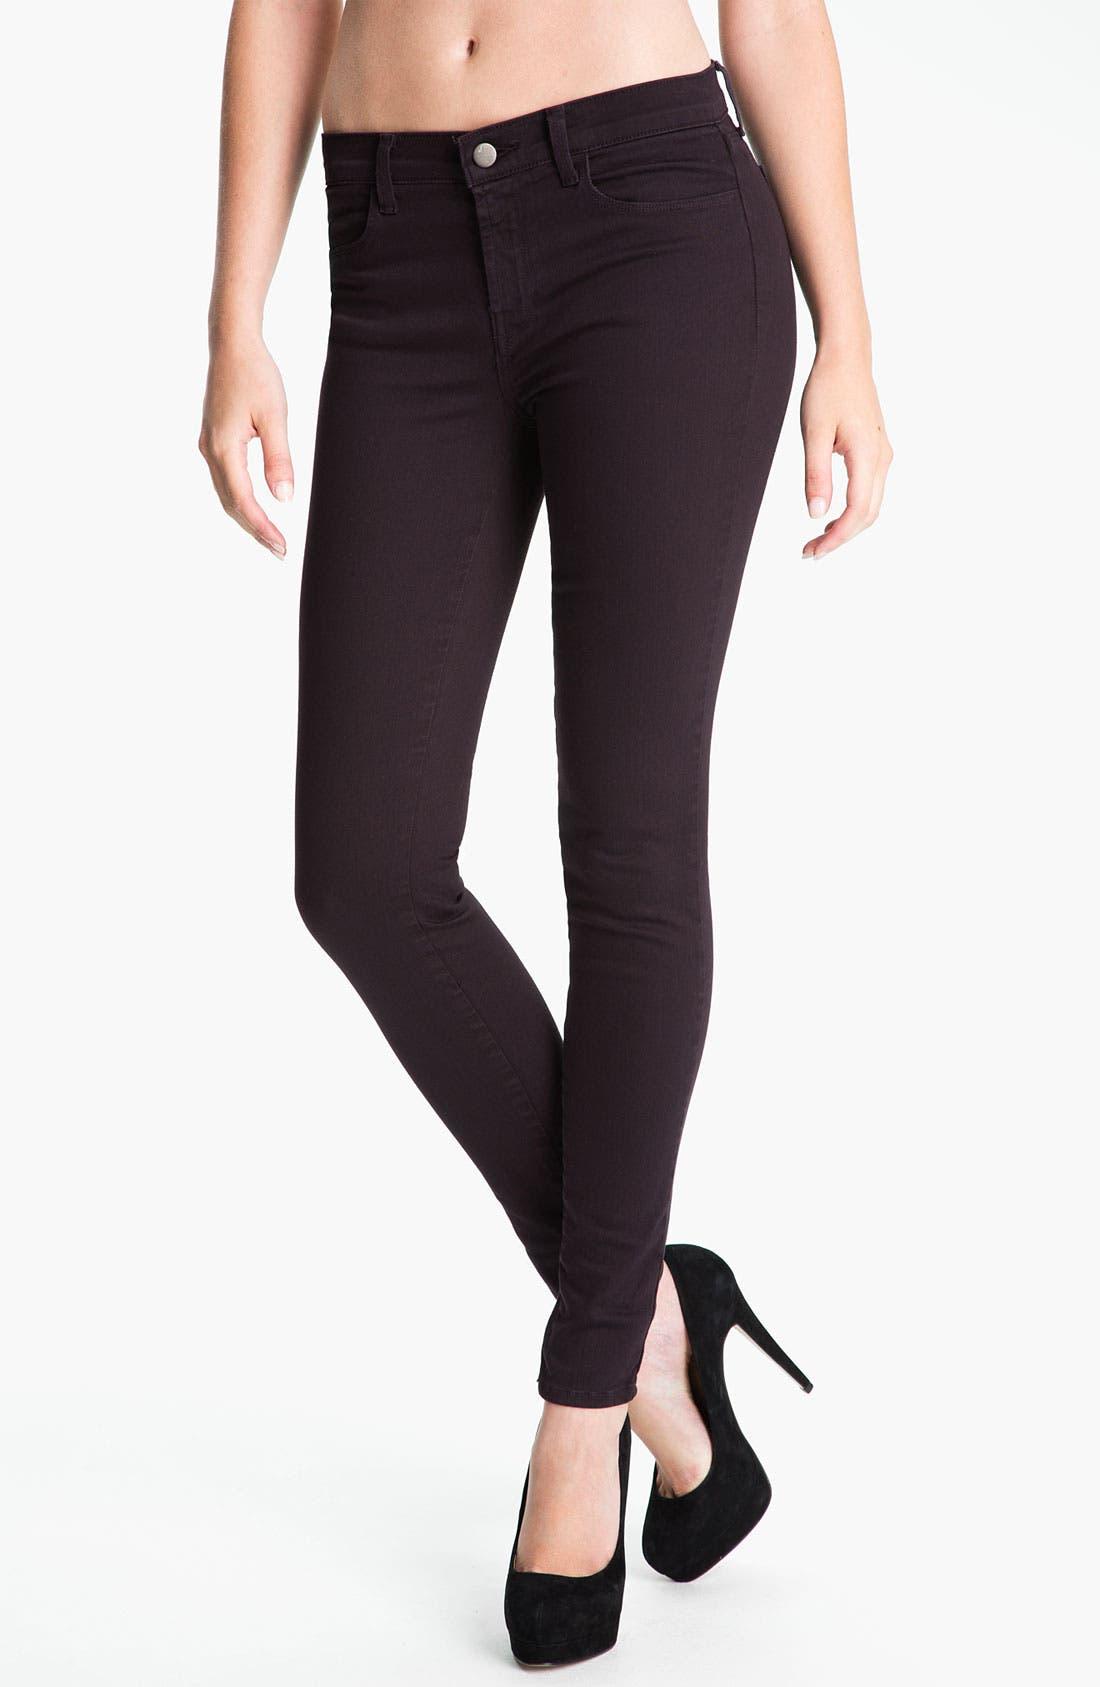 Alternate Image 1 Selected - J Brand Overdyed Super Skinny Jeans